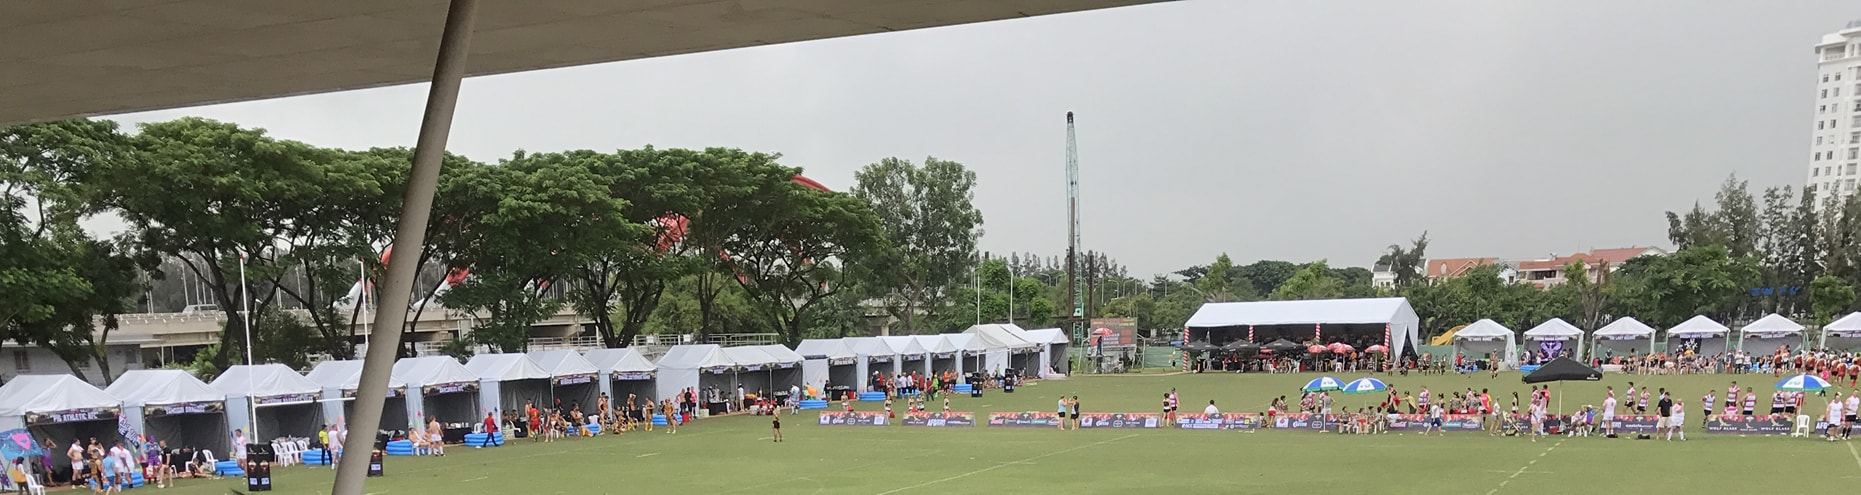 Saigon Rugby 10s 2018